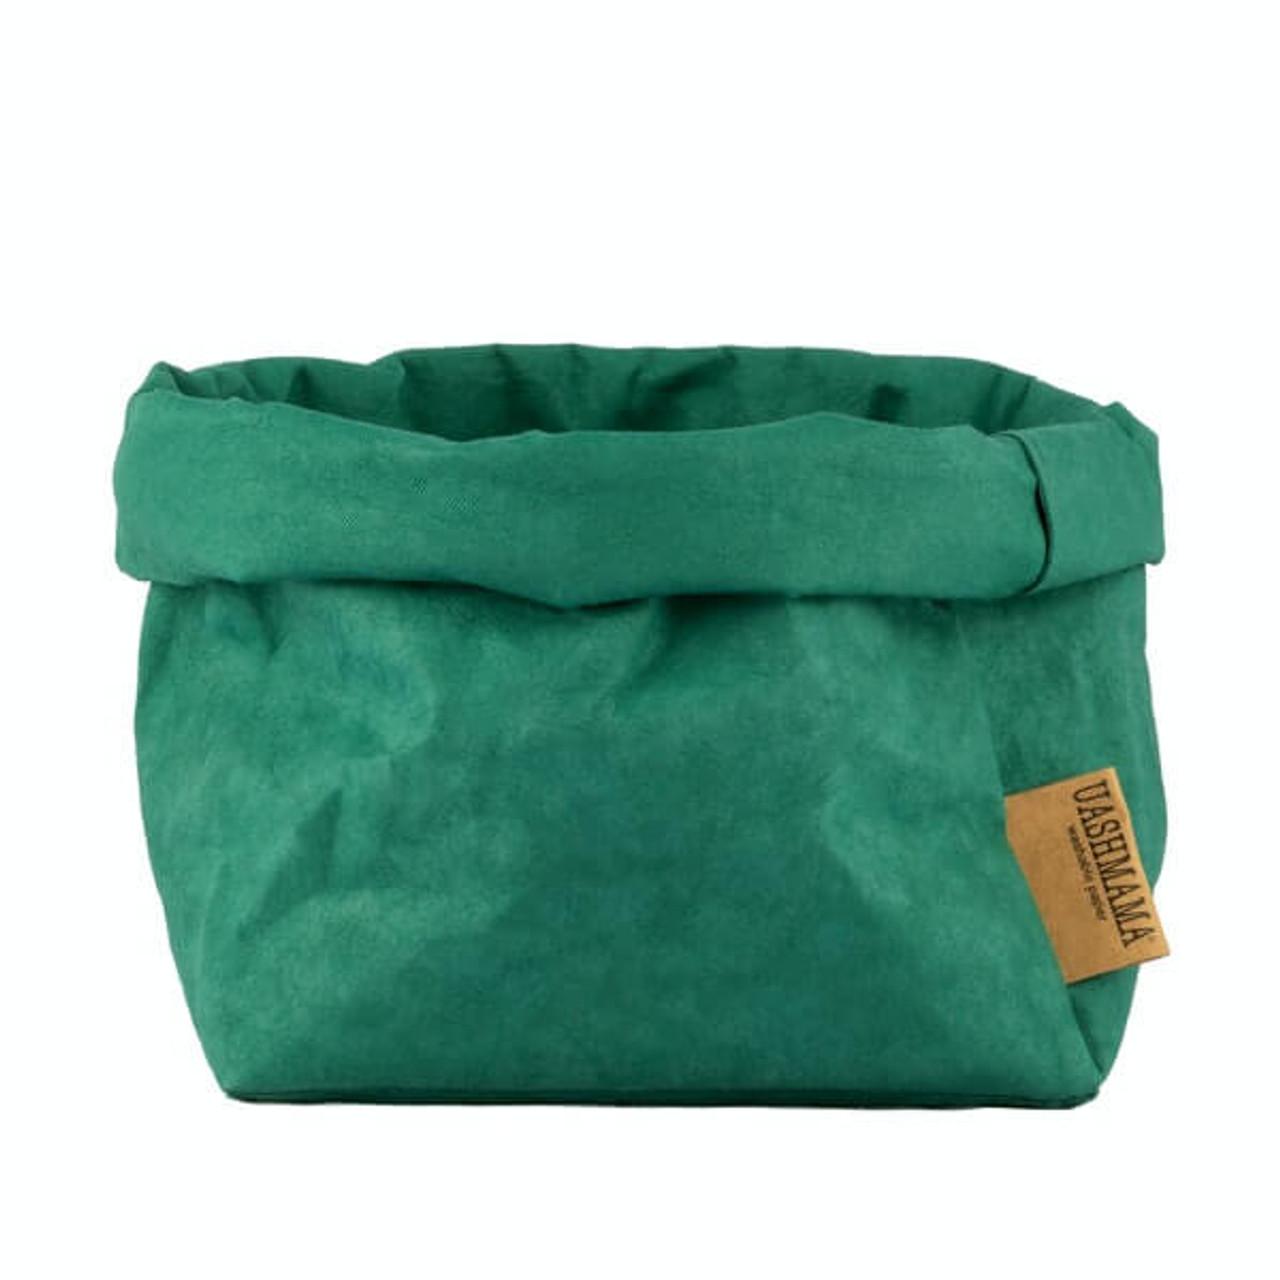 UASHMAMA large organic paper bags smeraldo